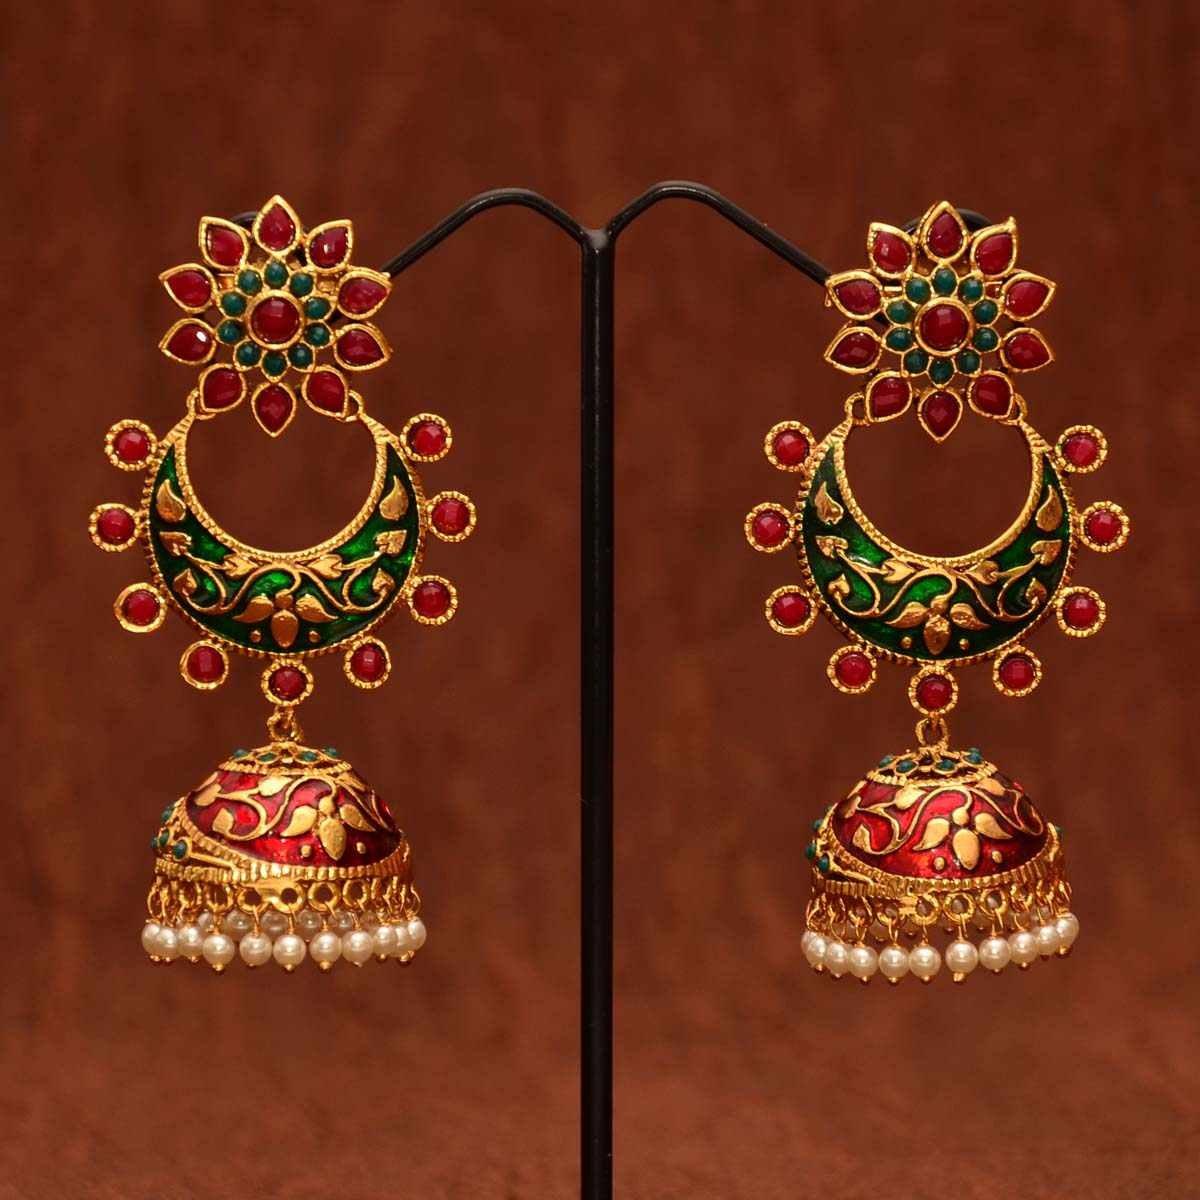 Chand bali online shopping